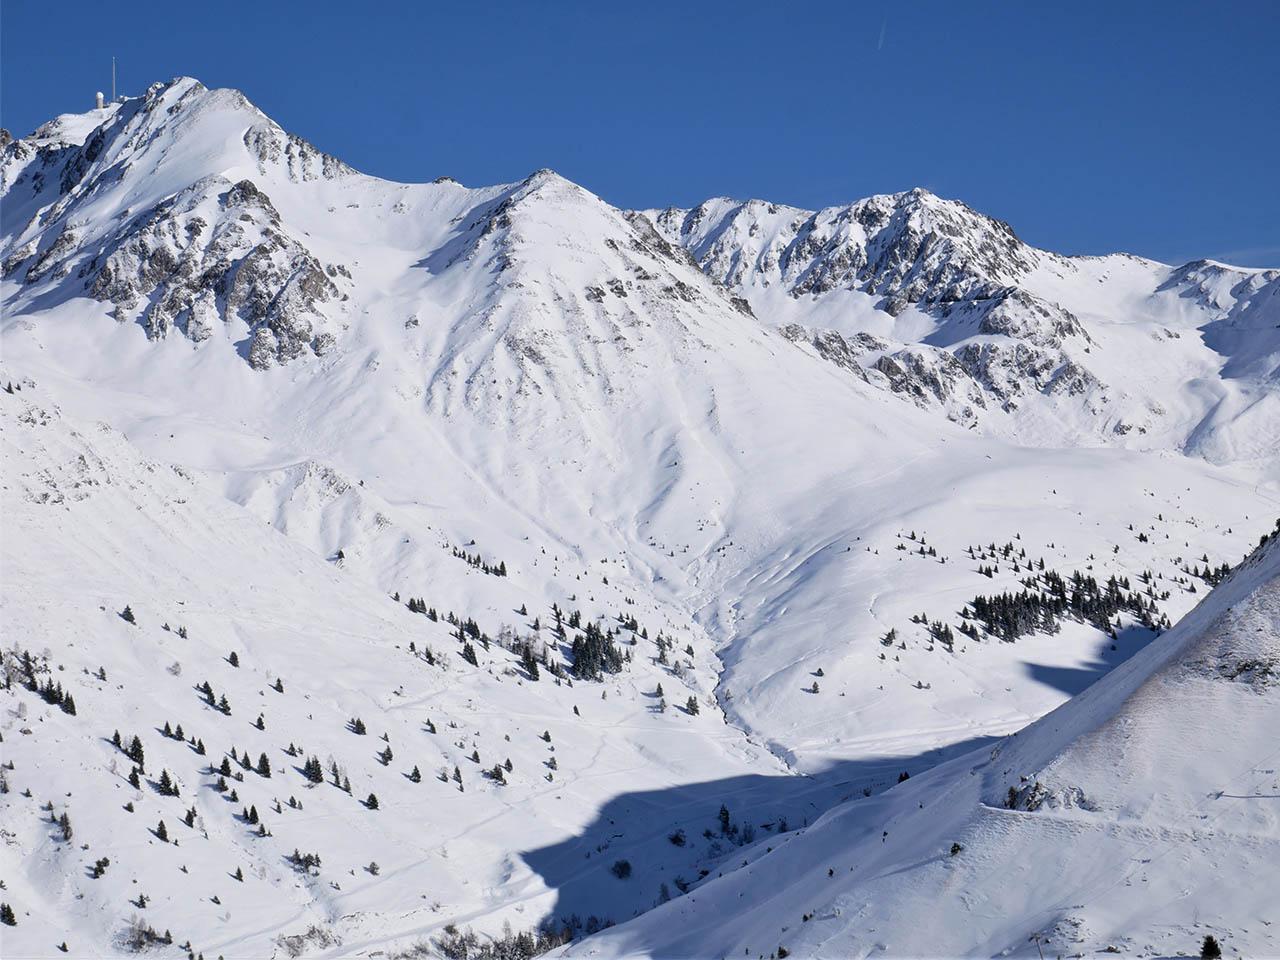 Domaine skiable grand tourmalet